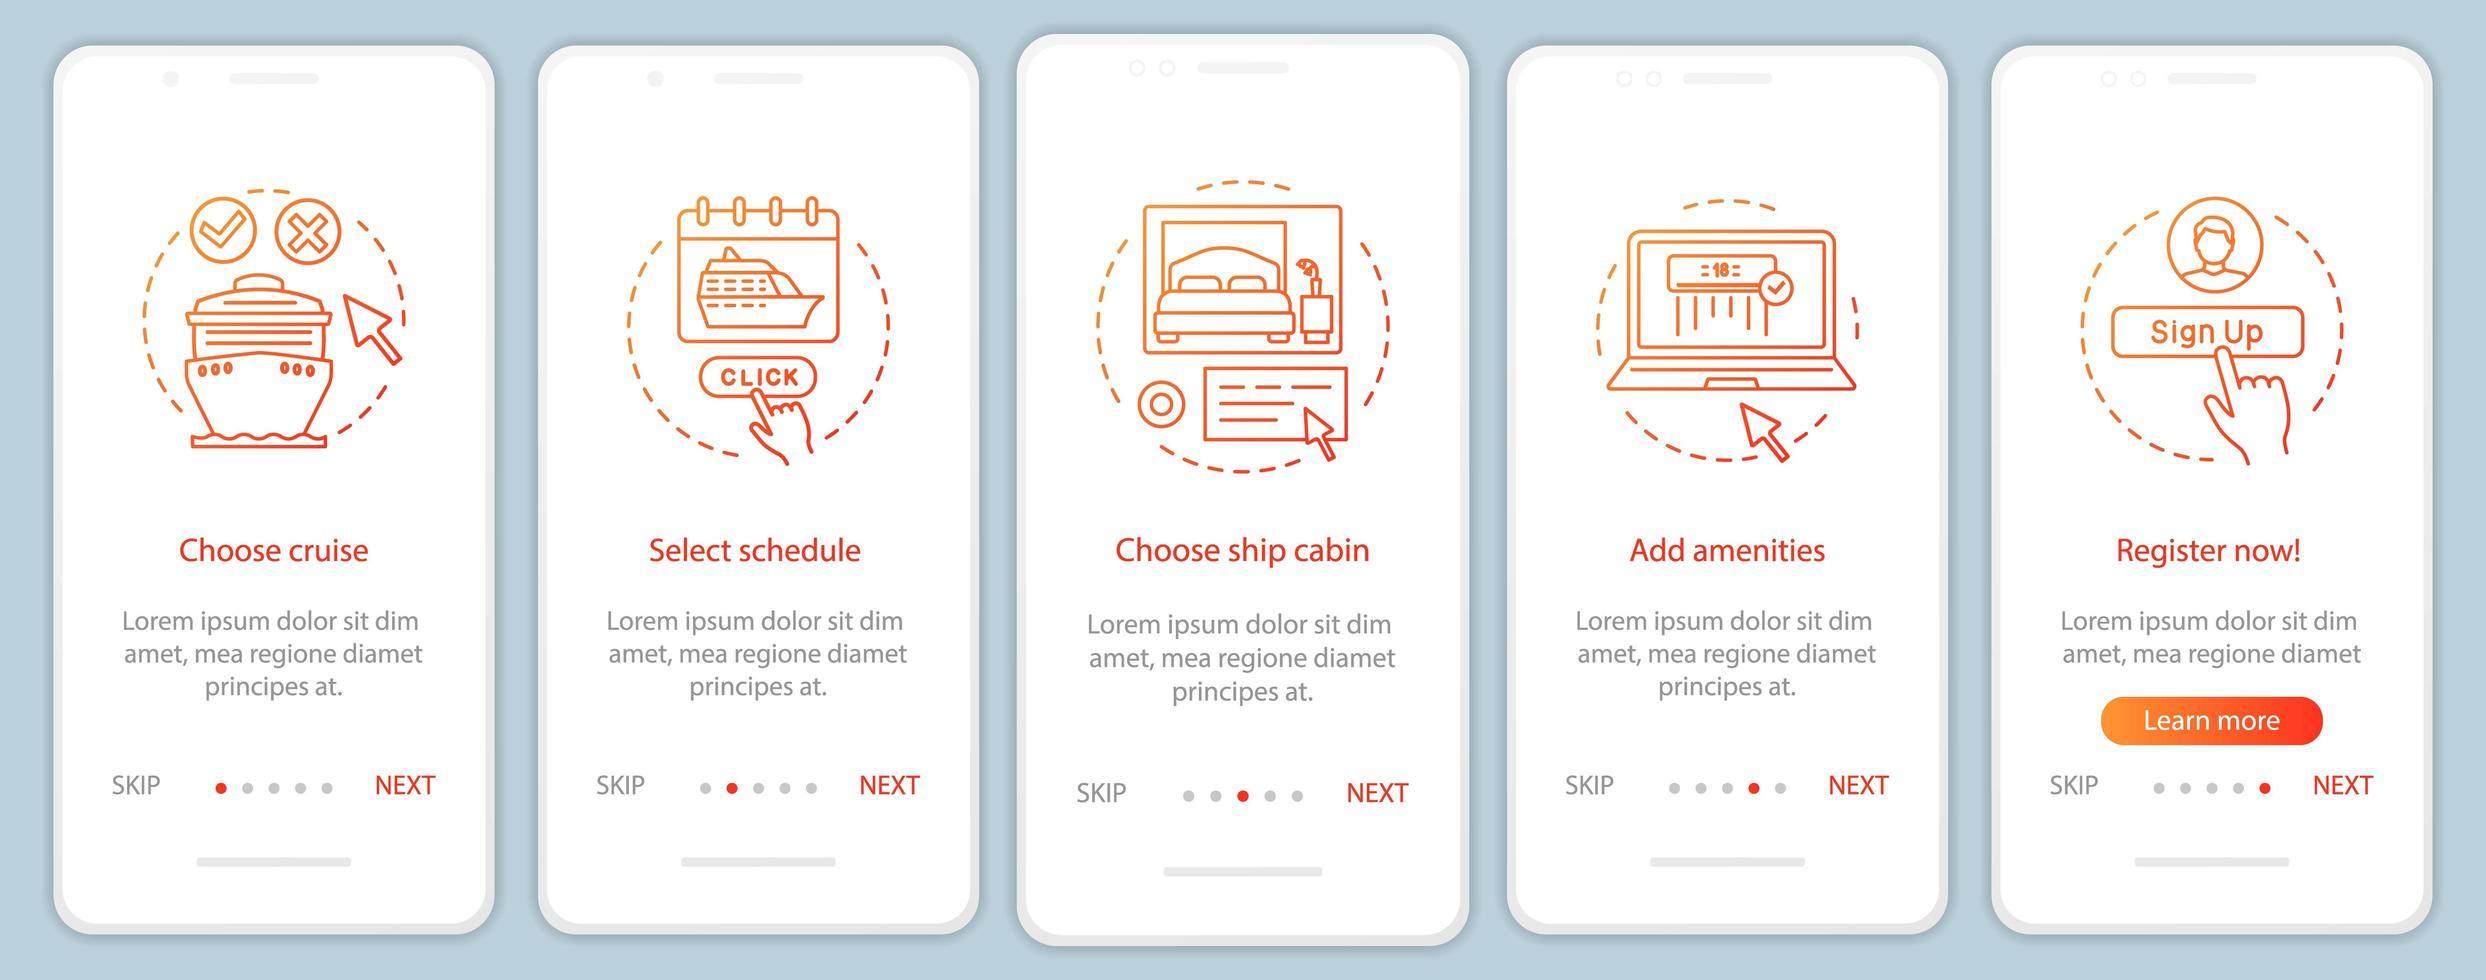 Online-Kreuzfahrtbuchung Onboarding Mobile App Seite Bildschirm vektor